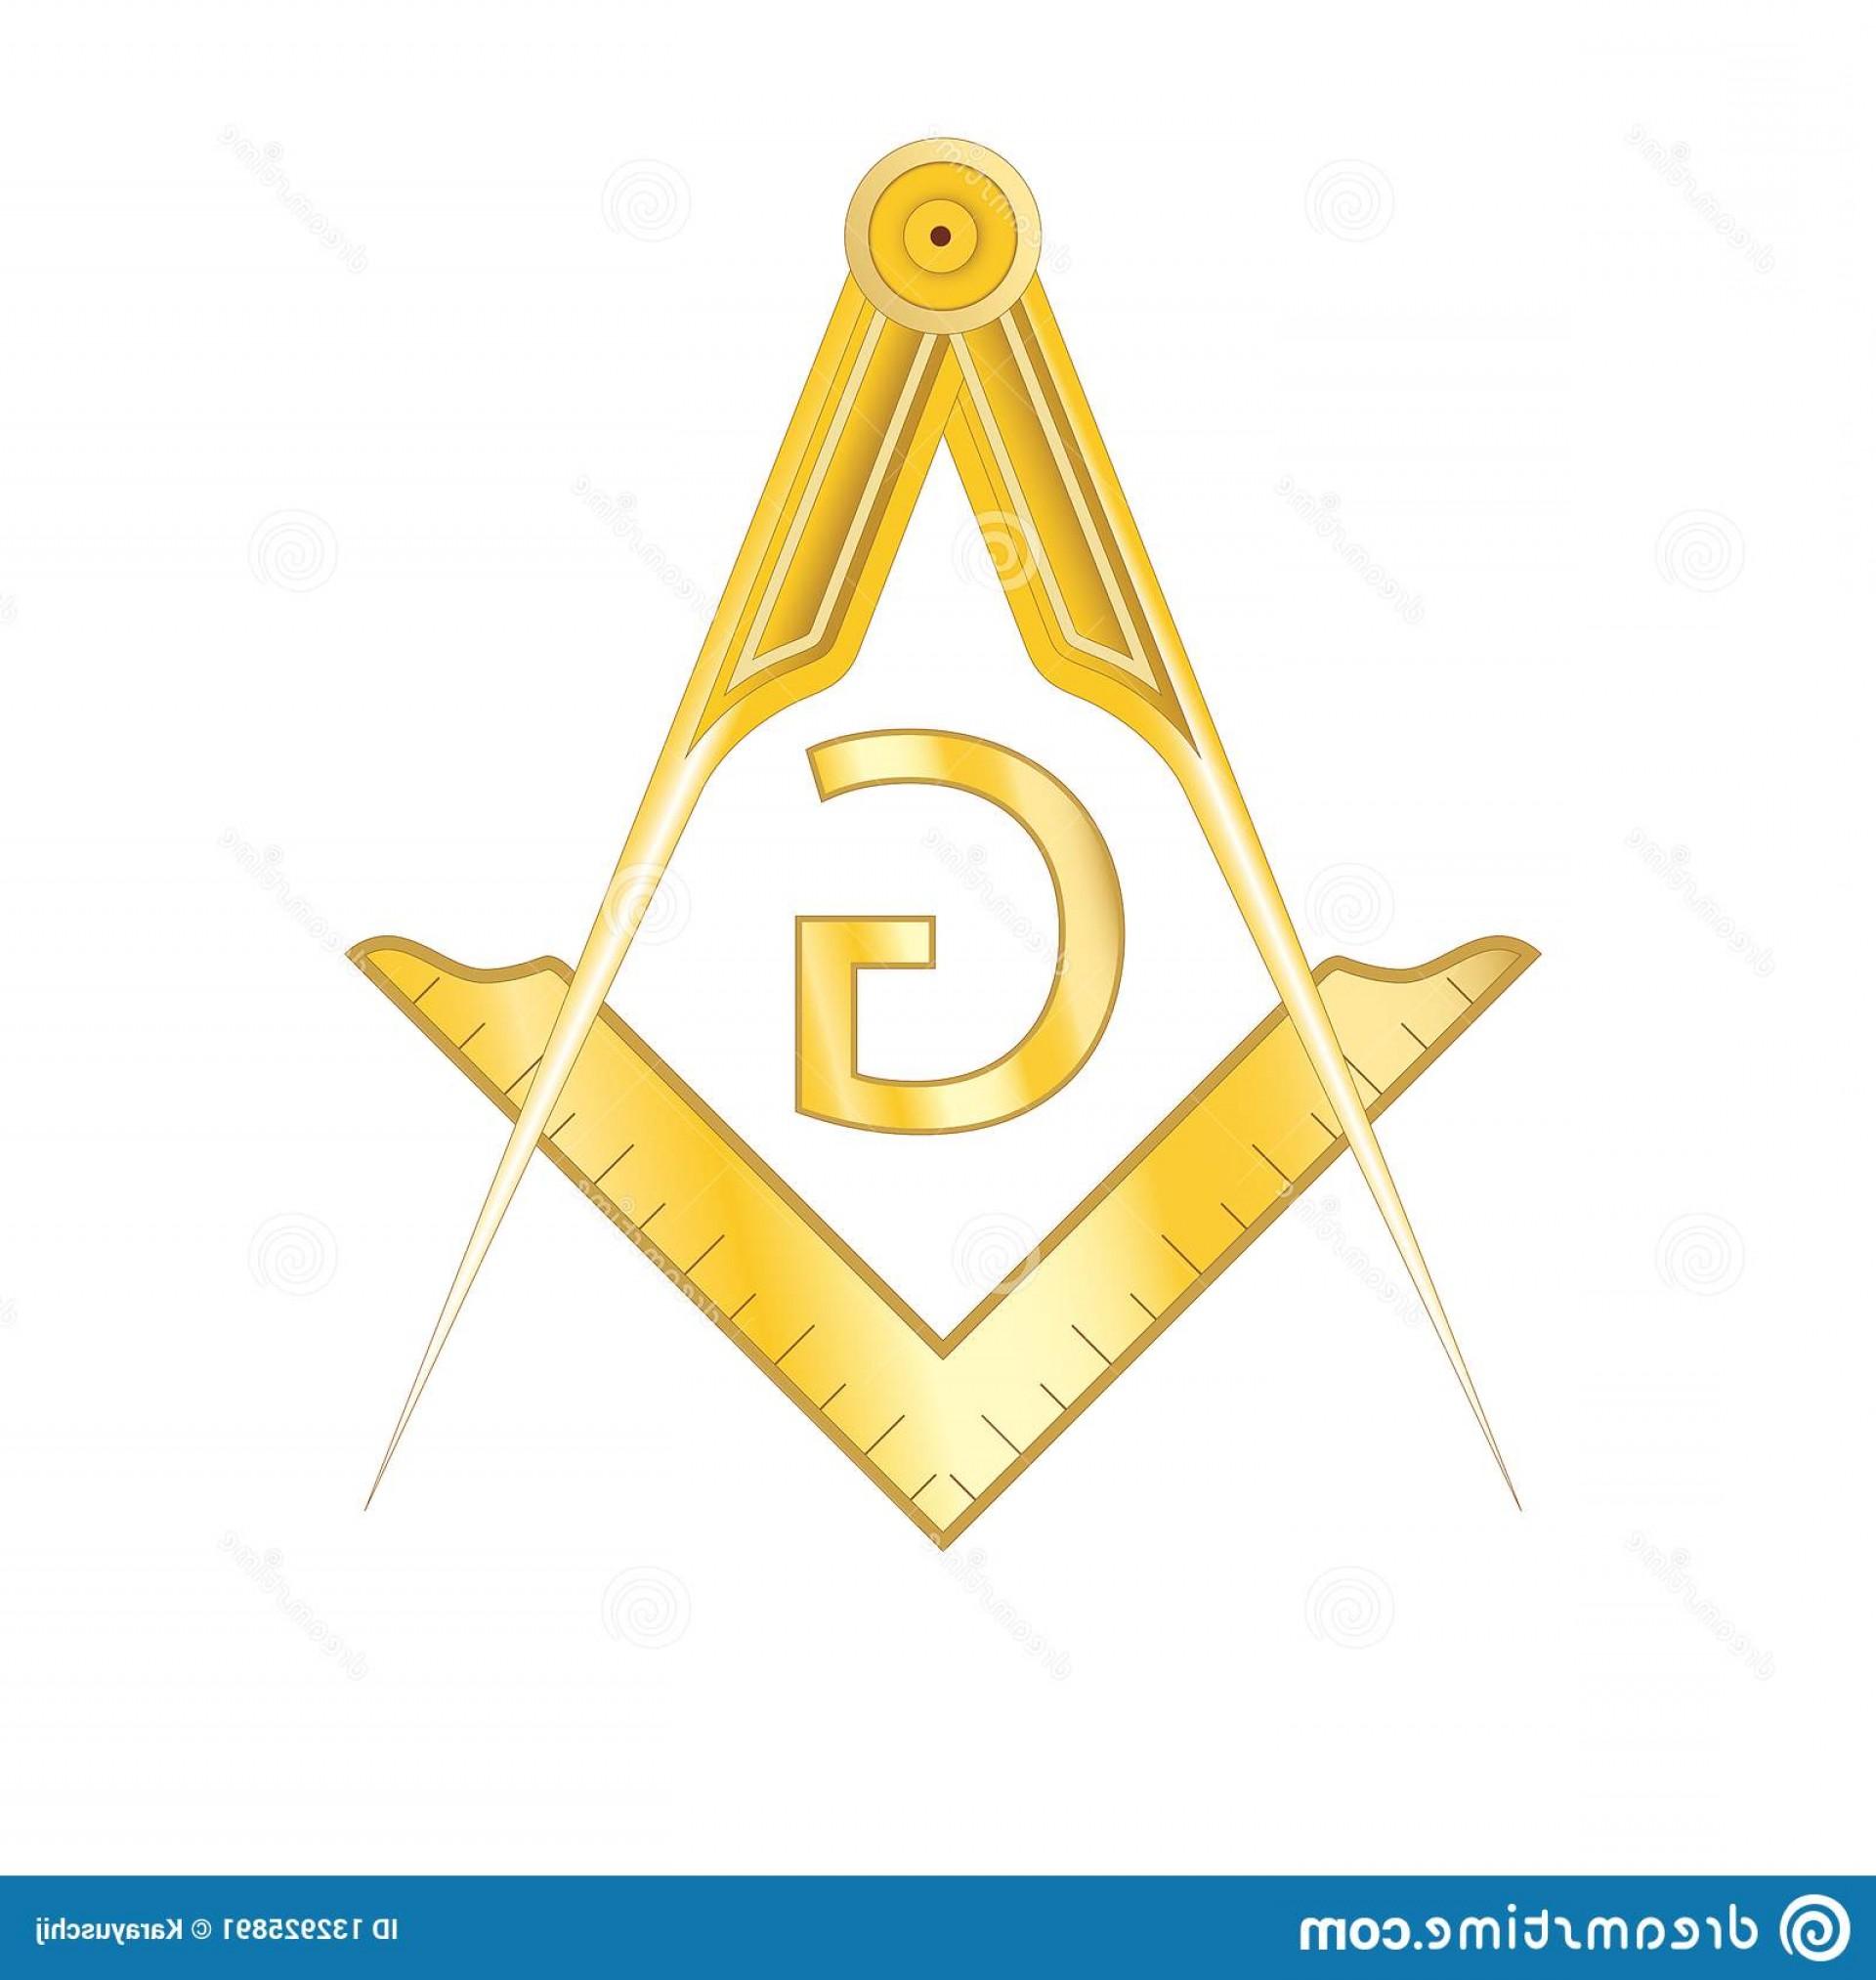 Golden Masonic Square Compass Symbol Golden Masonic Square.